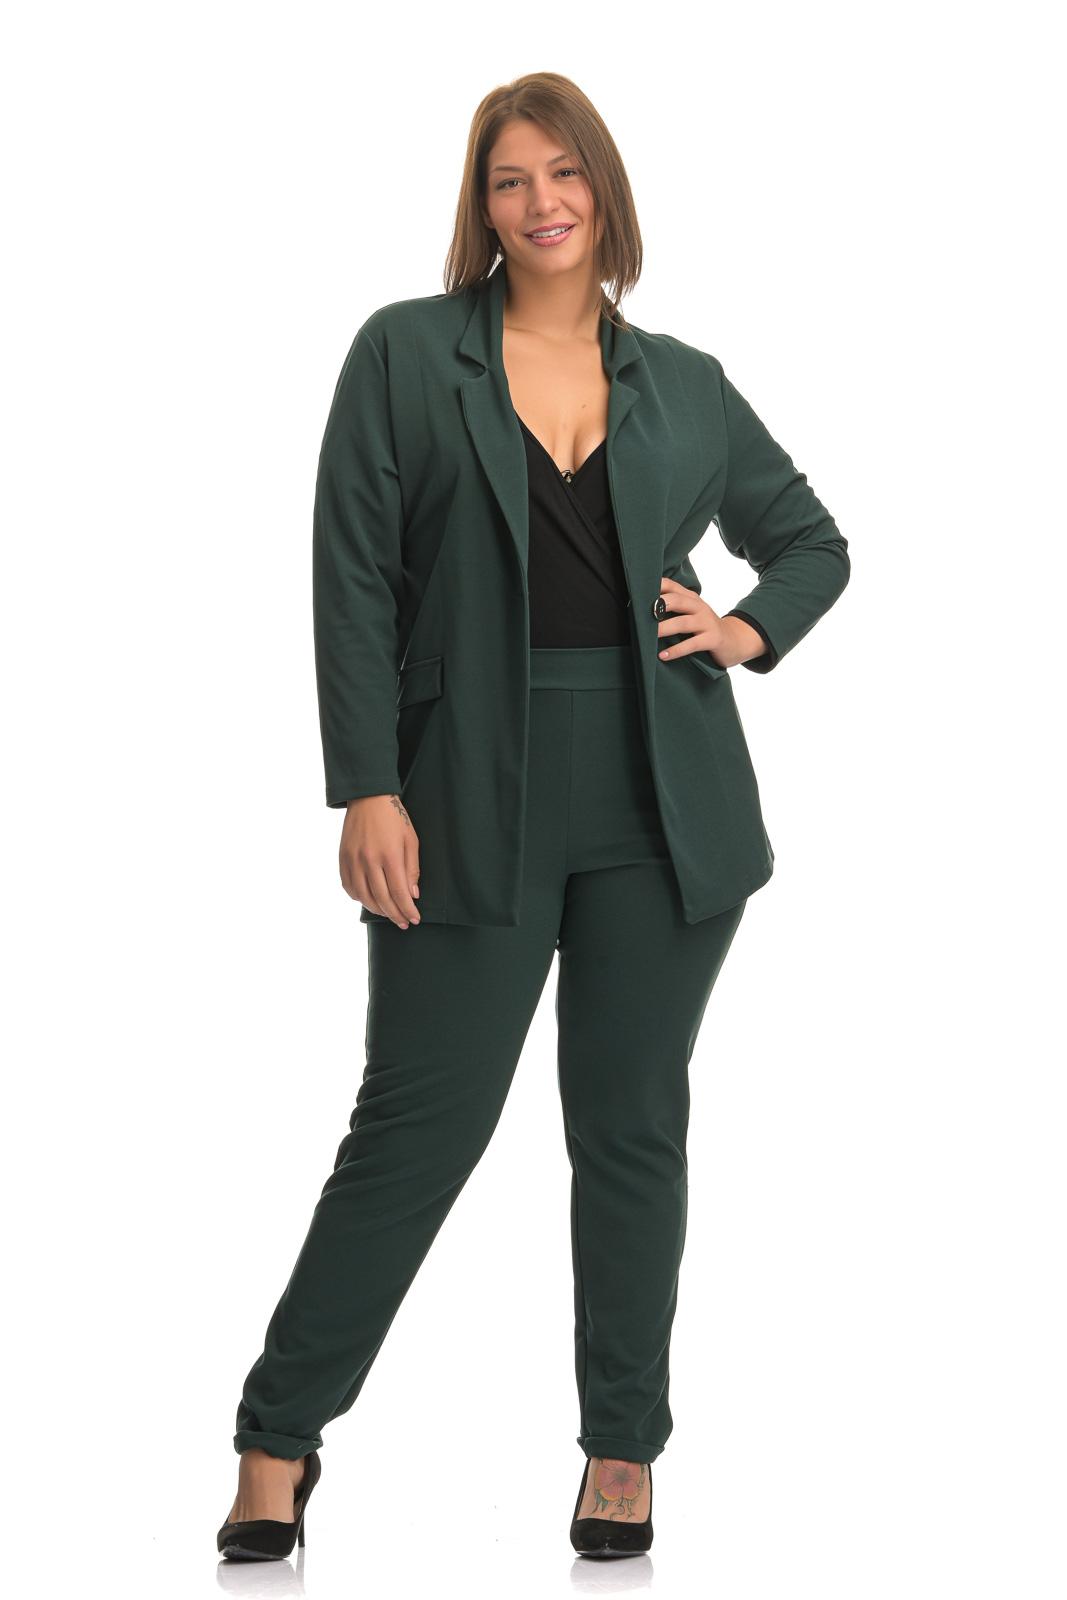 Blazer μεγάλα μεγέθη μαύρο με δέσιμο στα μανίκια και ζωνάκι.Στο eshop μας θα βρείτε οικονομικά γυναίκεια ρούχα σε μεγάλα μεγέθη και υπερμεγέθη.